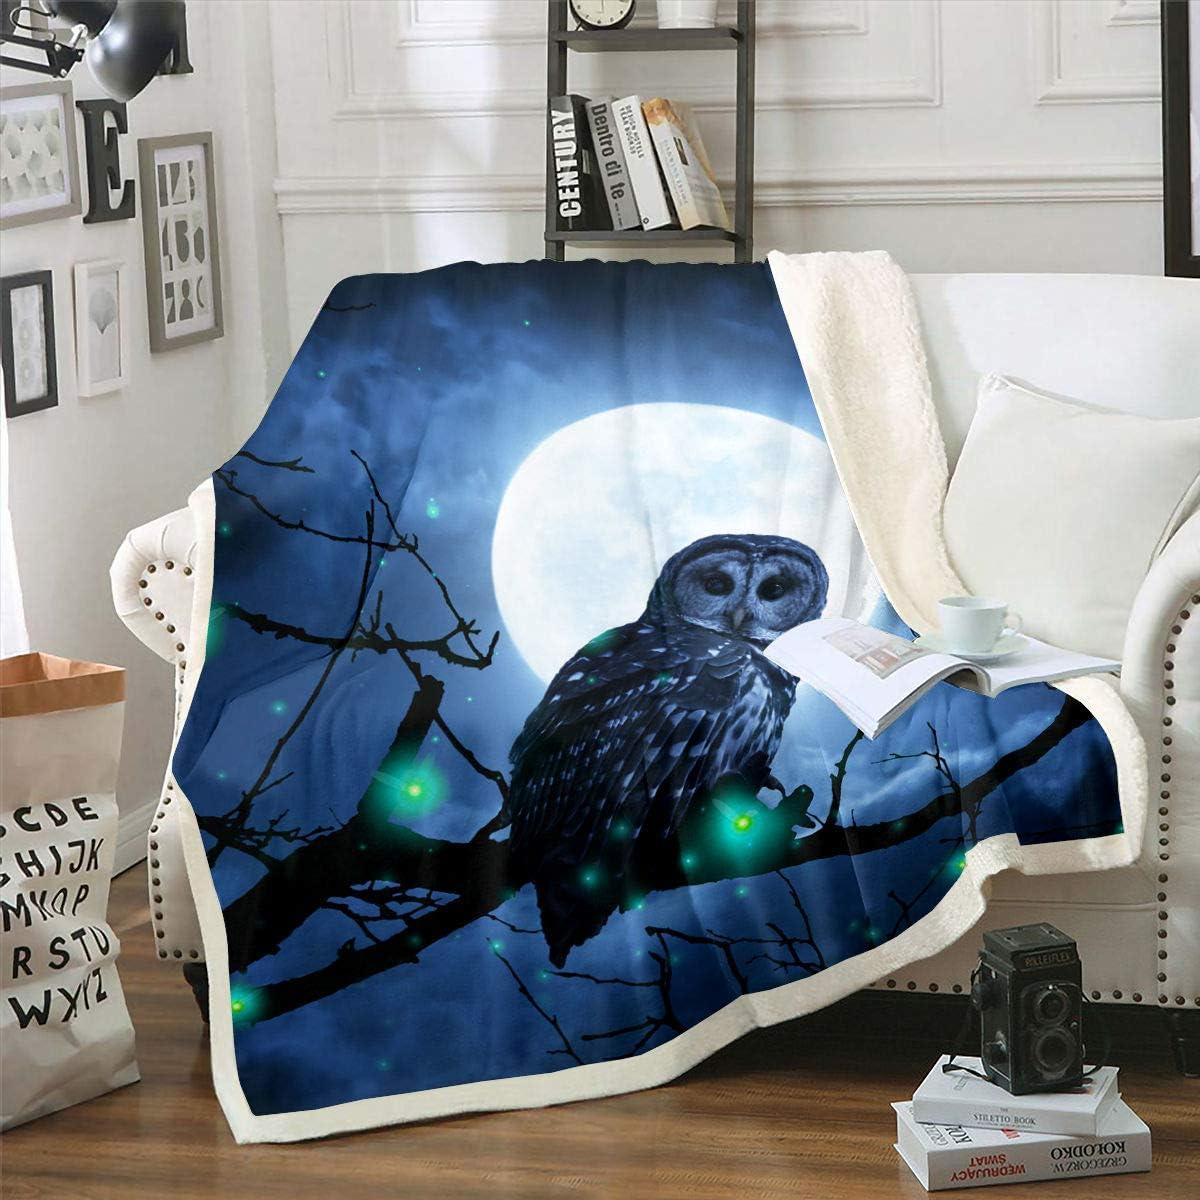 Castle Fairy Moon Owl Nightigar Blanket Three Stand on Throw Low price Austin Mall Ret